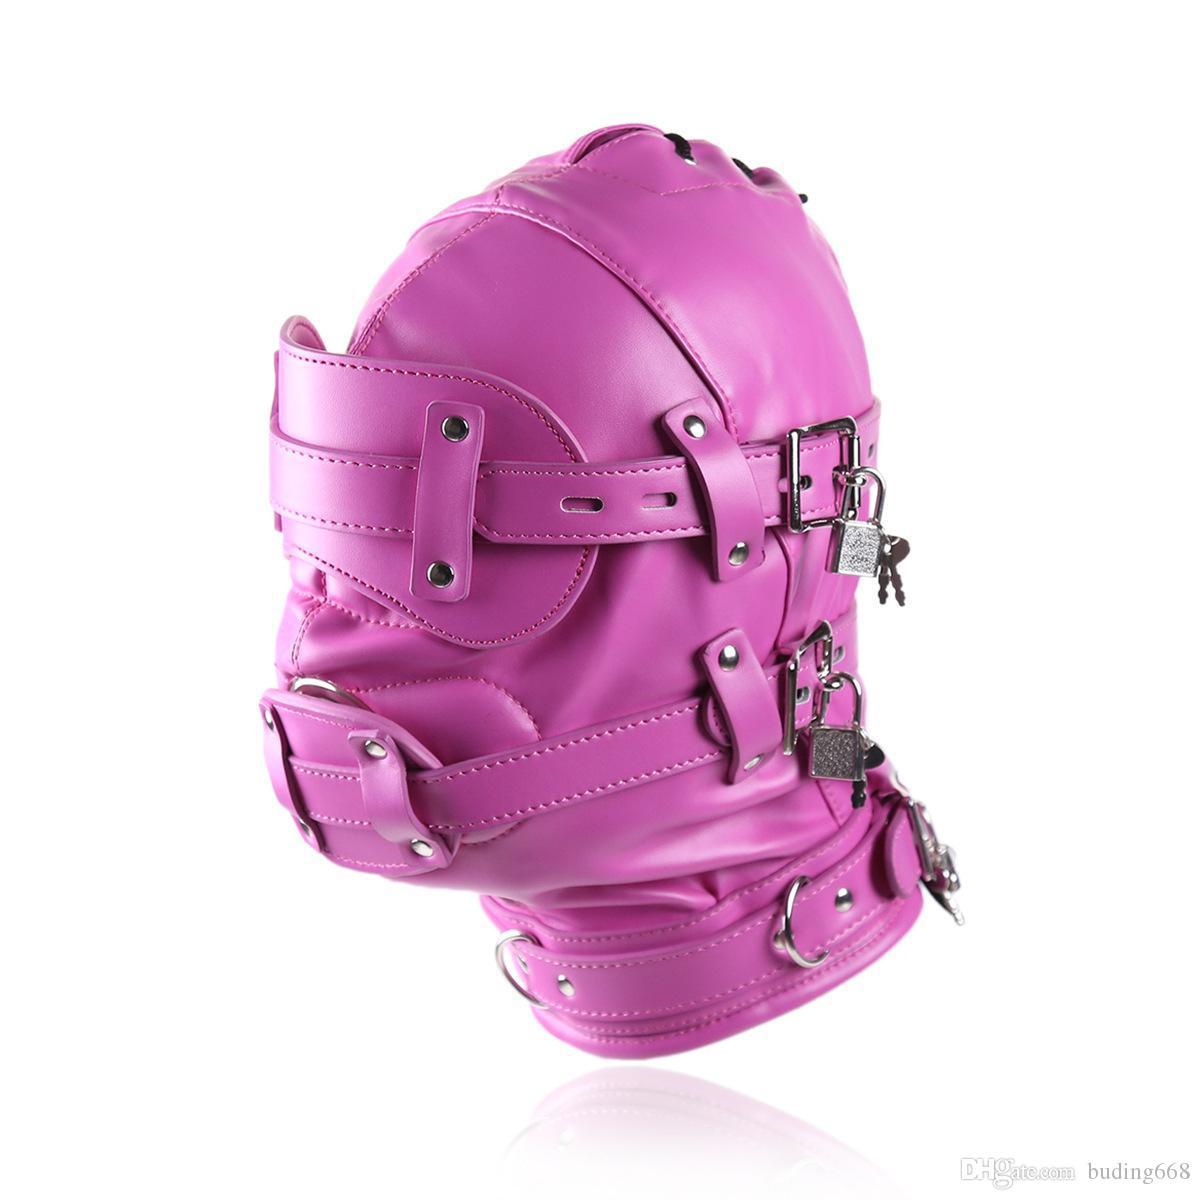 2020 Erotic Sex BDSM Bondage Leather Hood for Adult Play Games Full Masks Fetish Face Blindfold for Couple Games L567